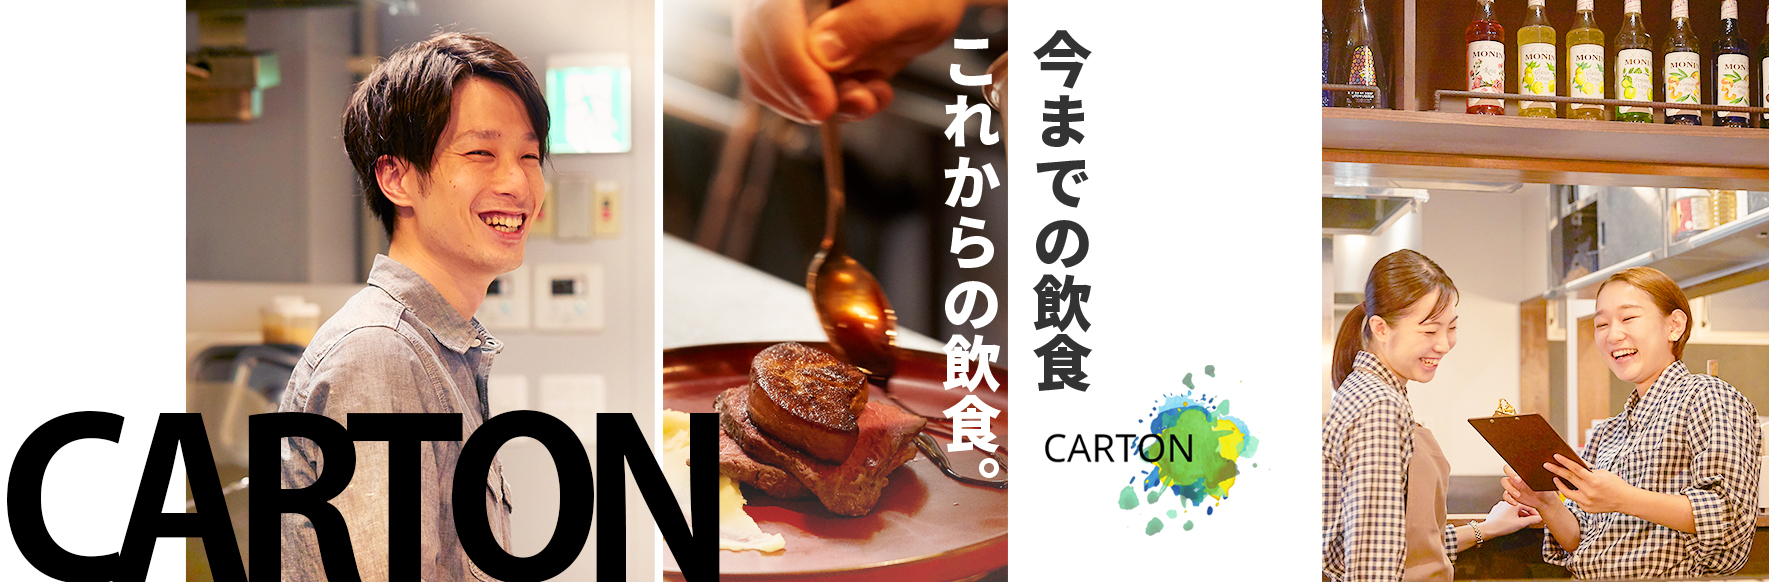 株式会社CARTON